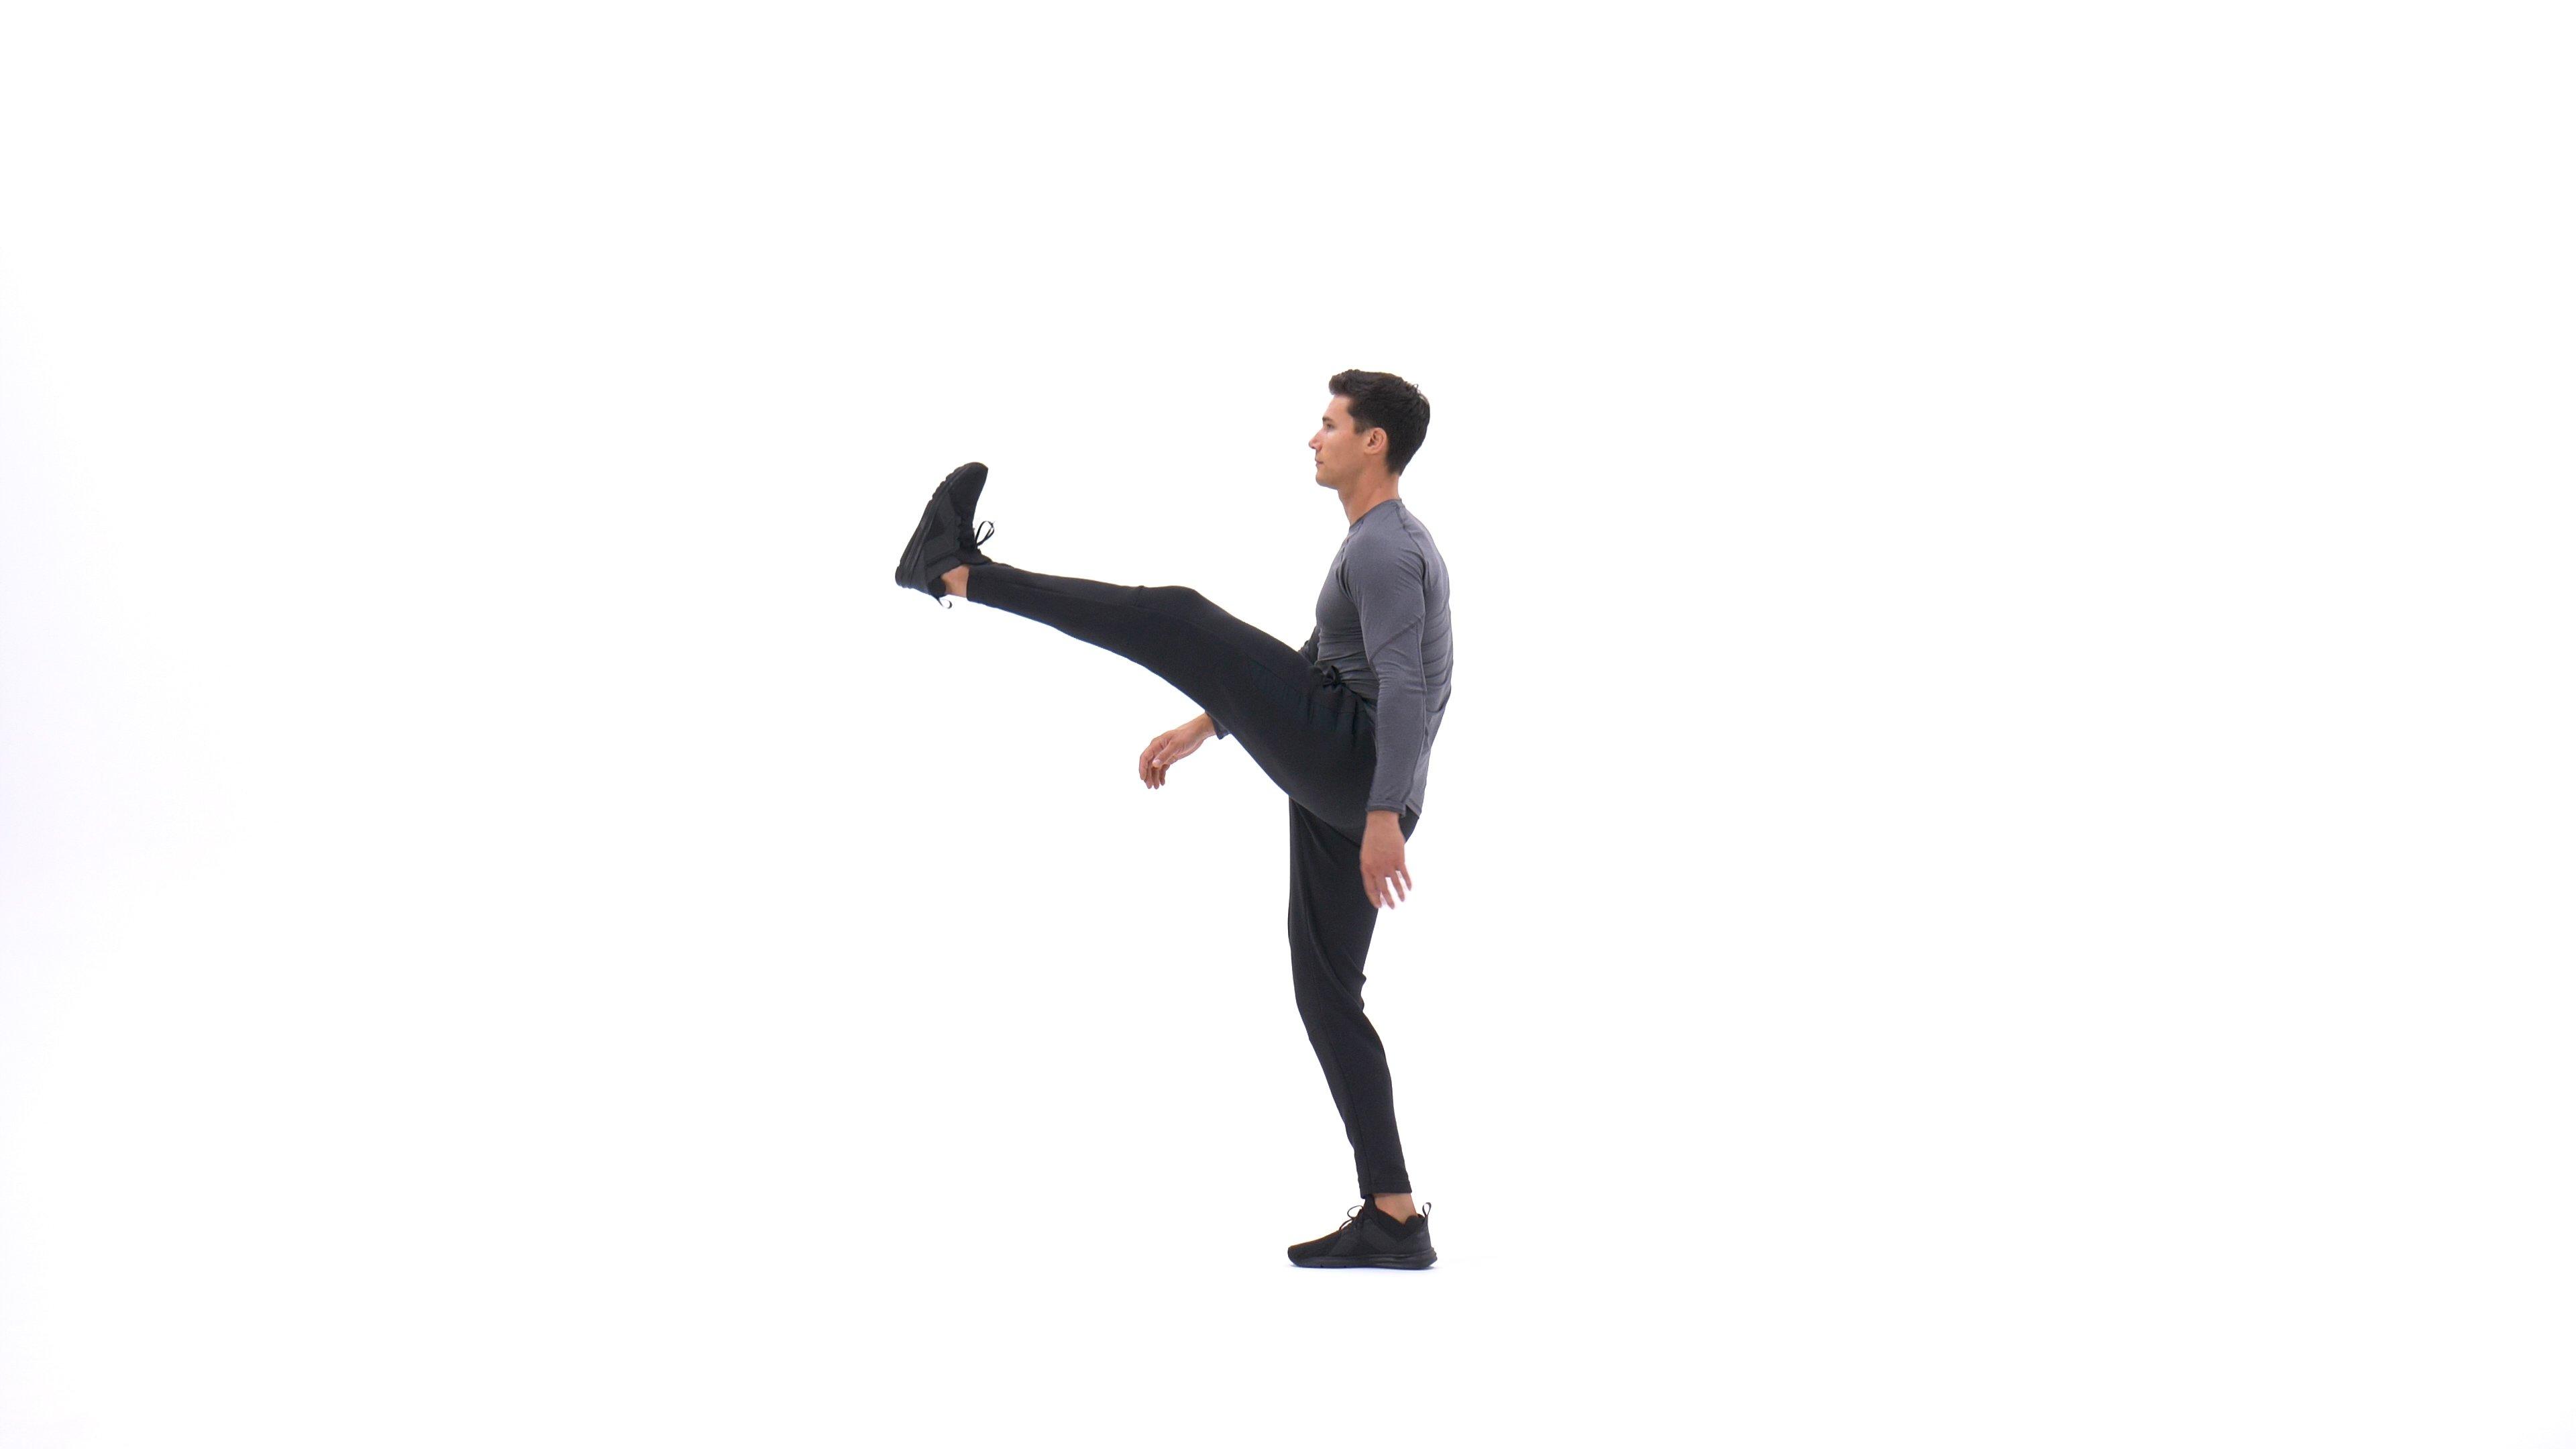 Standing leg swing image